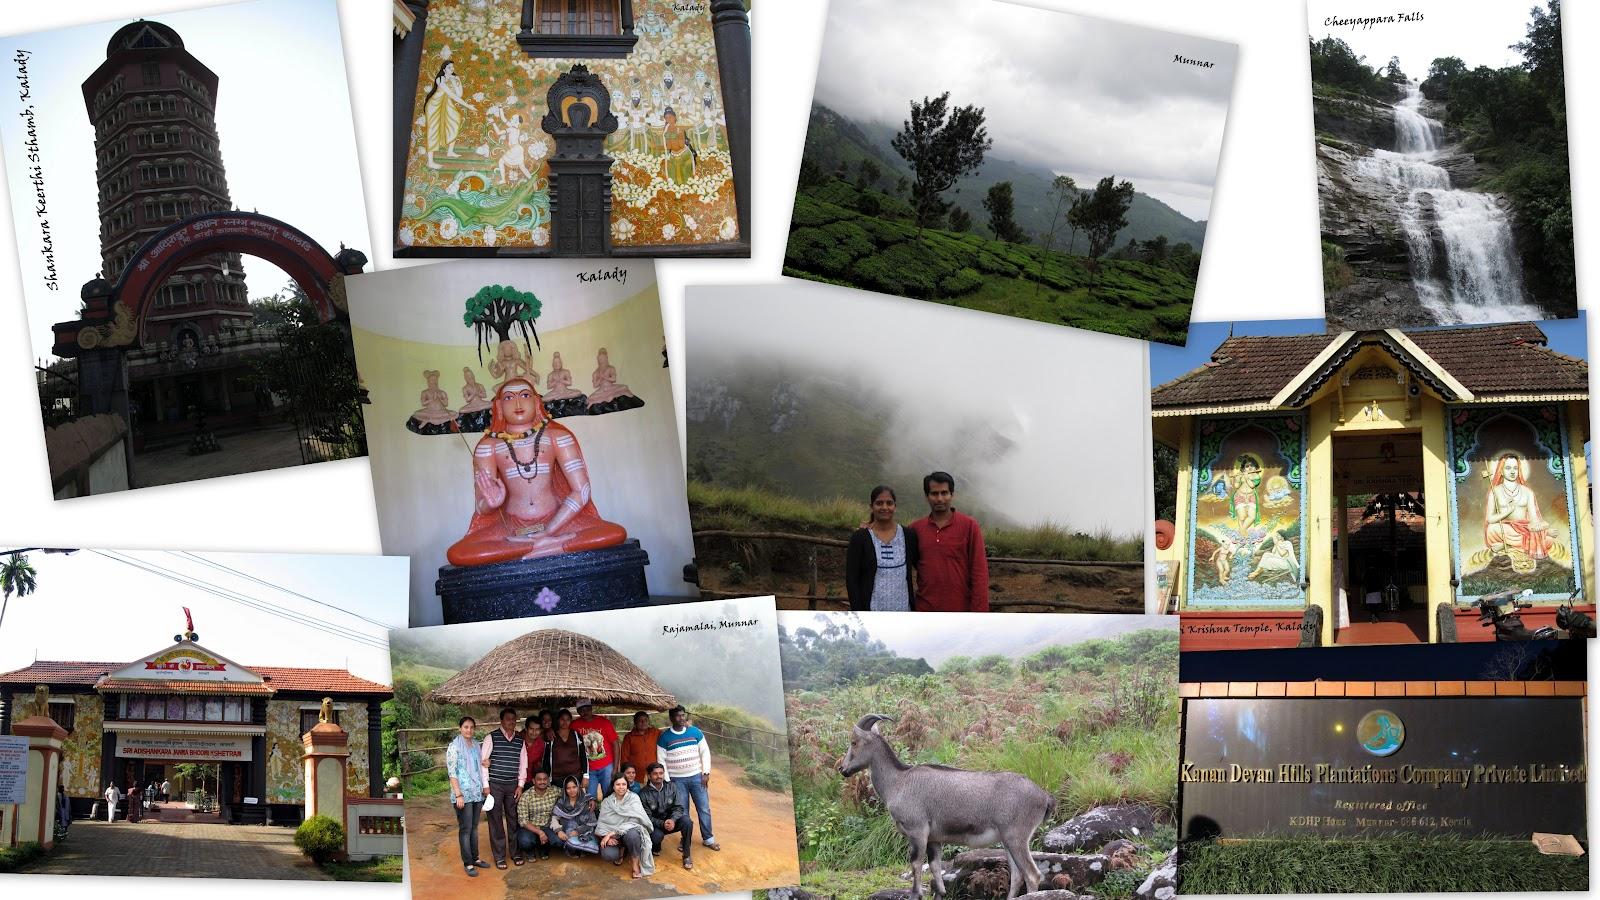 Kerala Tour Package From Bangalore Nirmala Travels